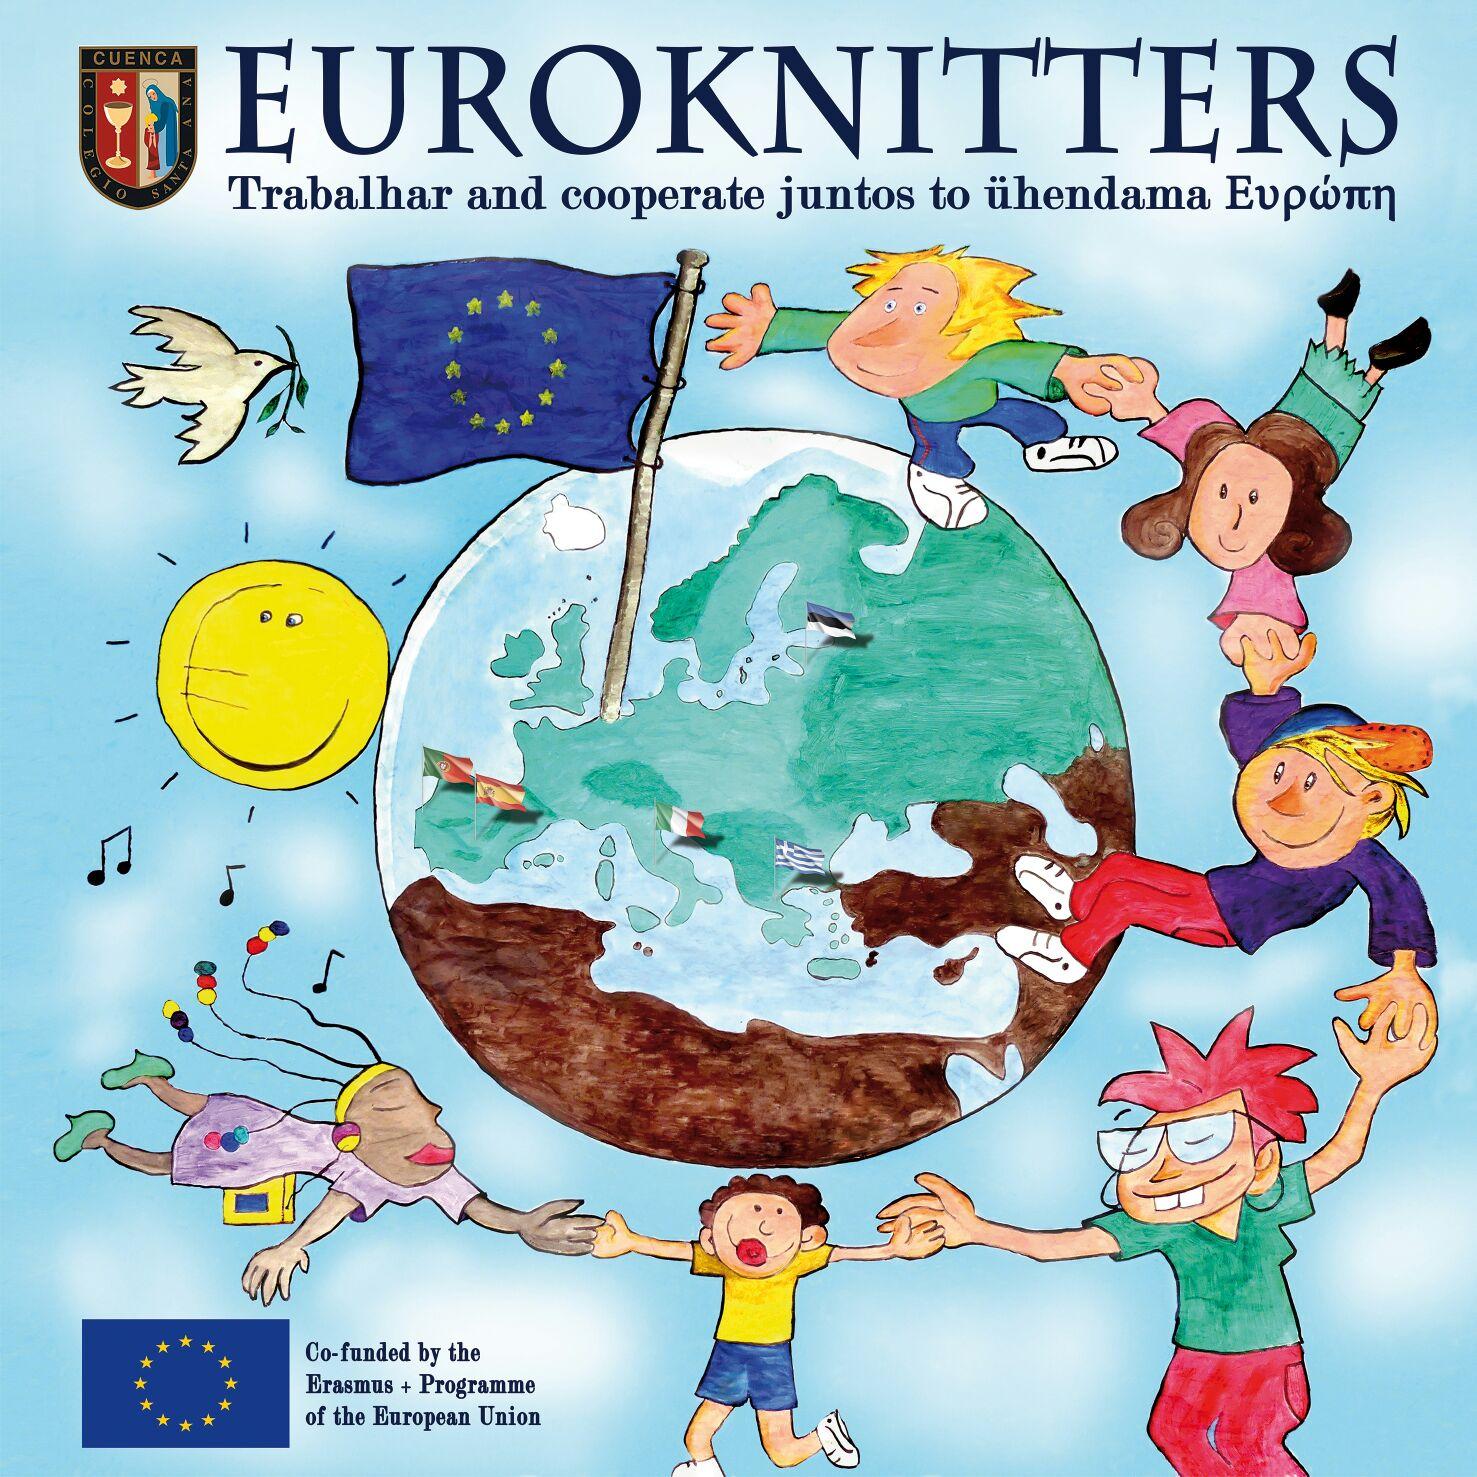 EUROKNITTERS. ERASMUS+ 2017/2019